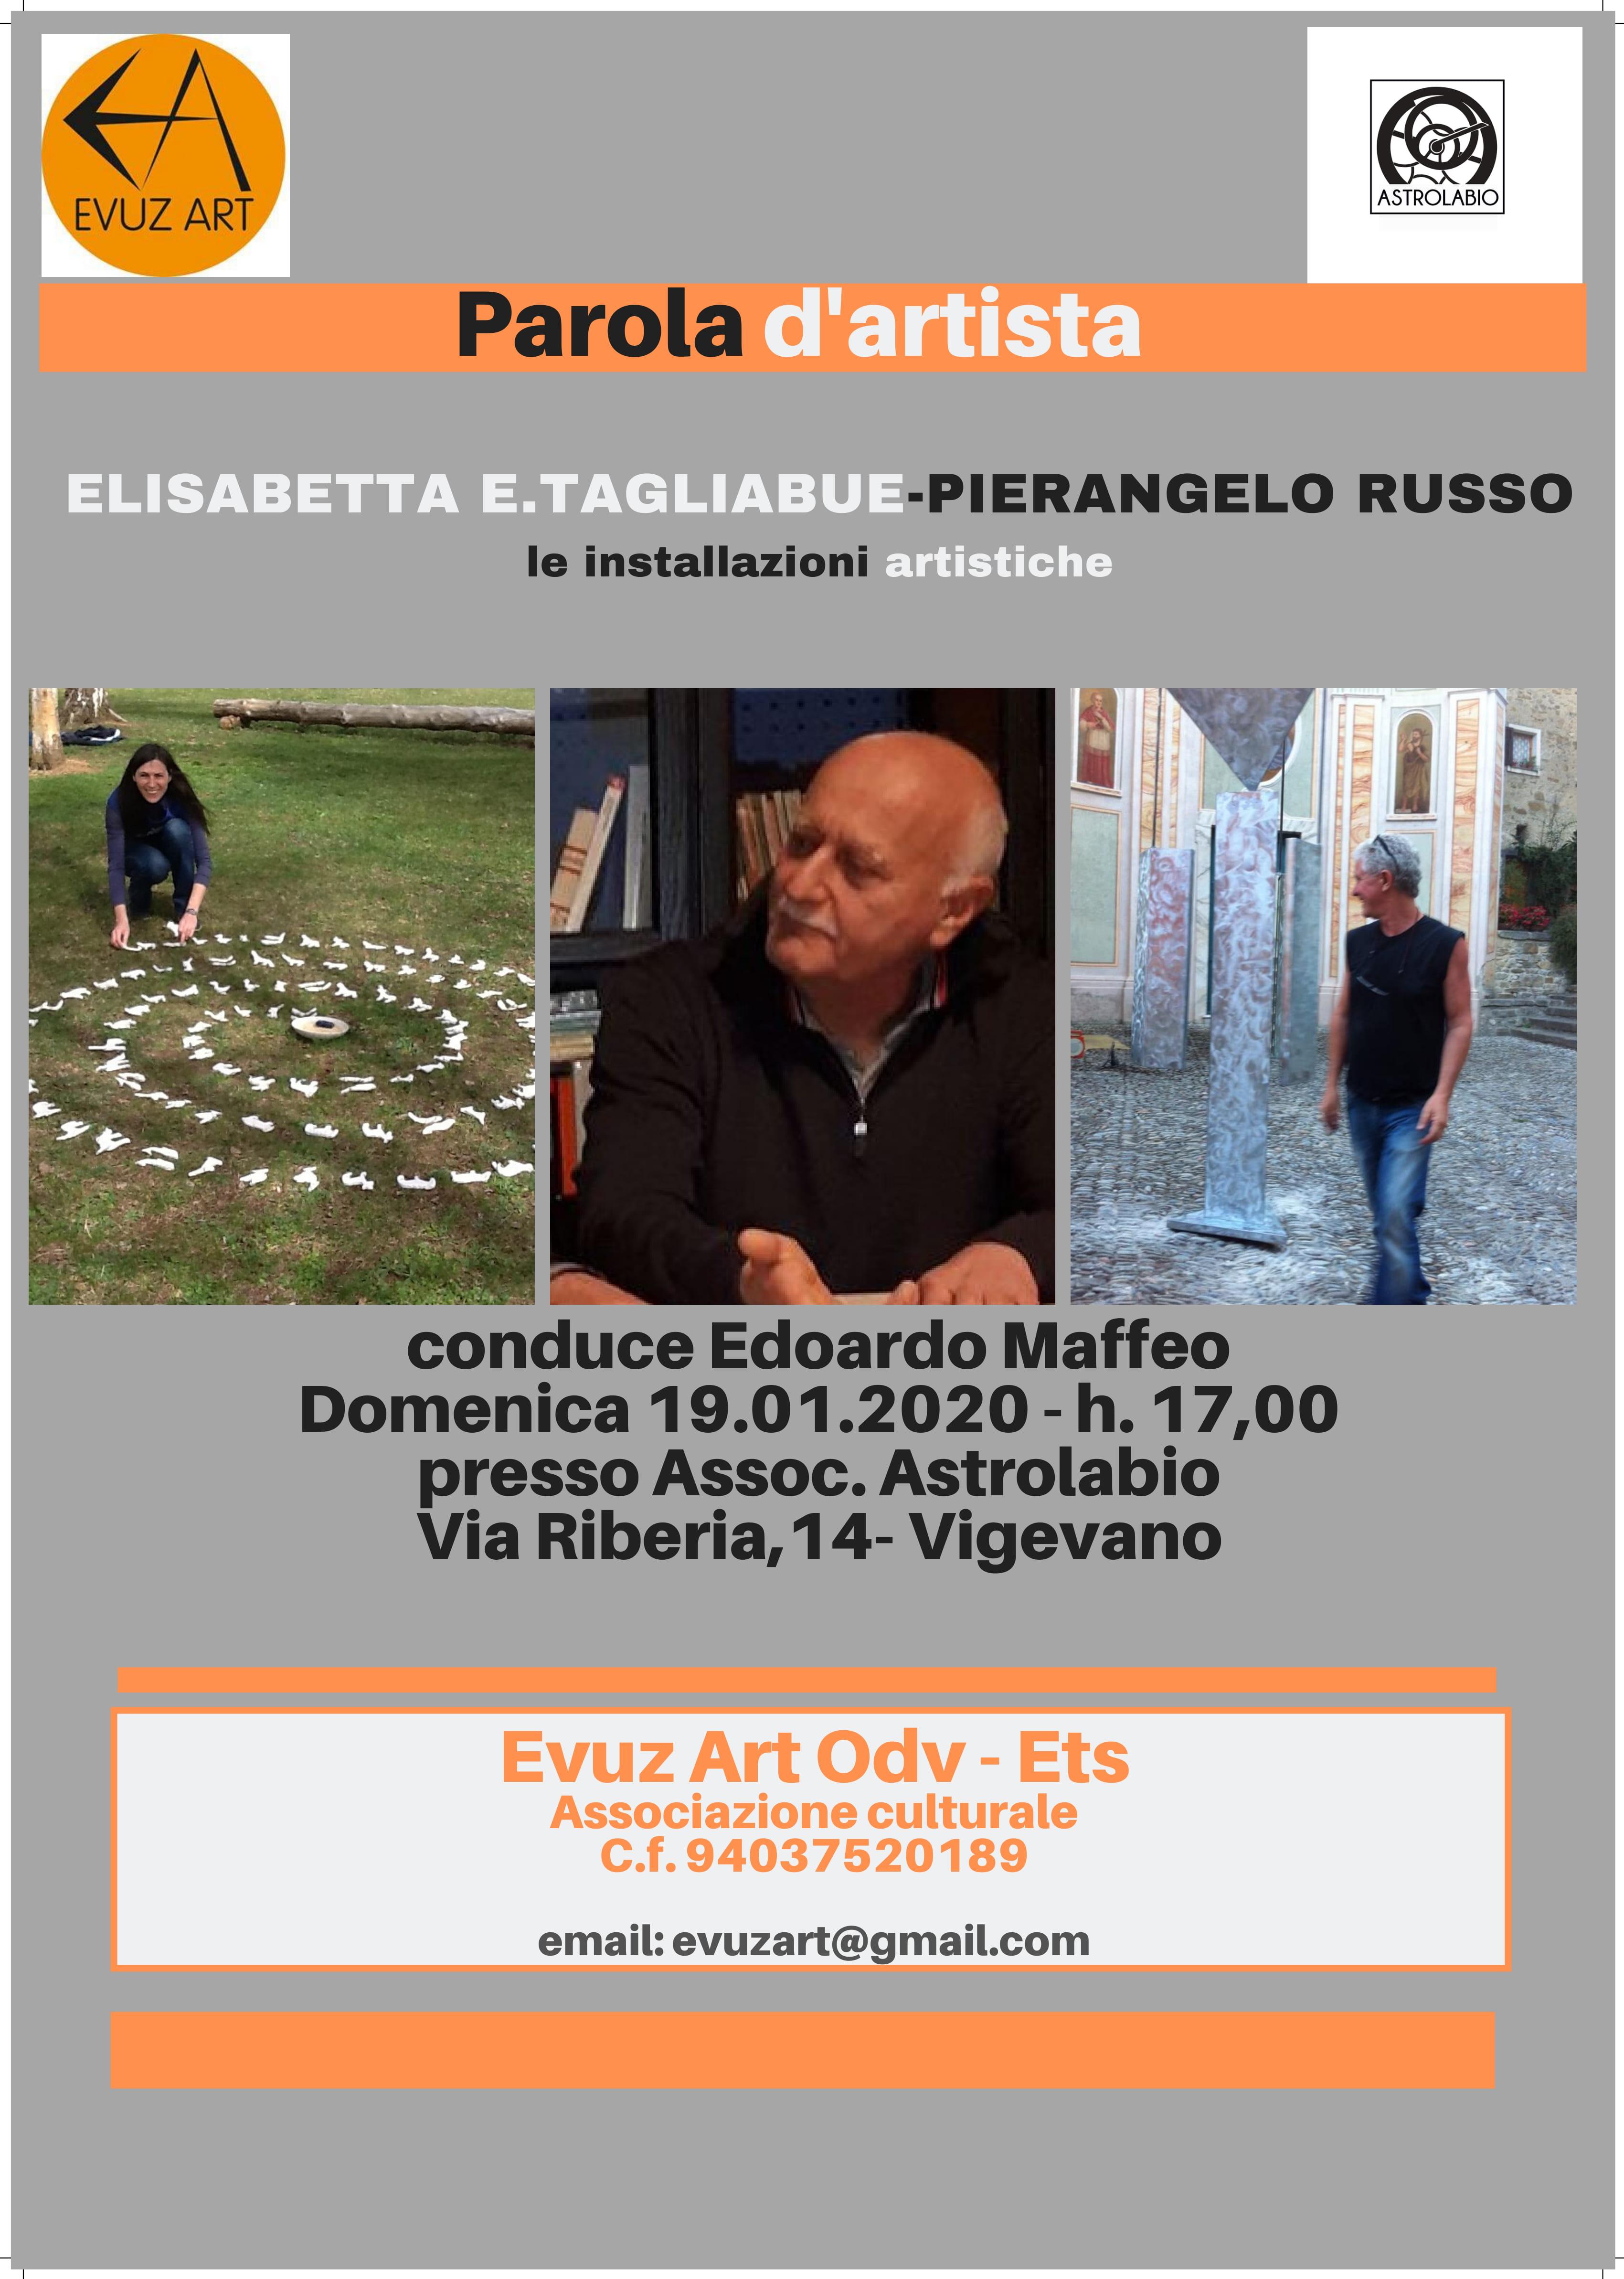 ElisabettaTagliabue- PierangeloRusso